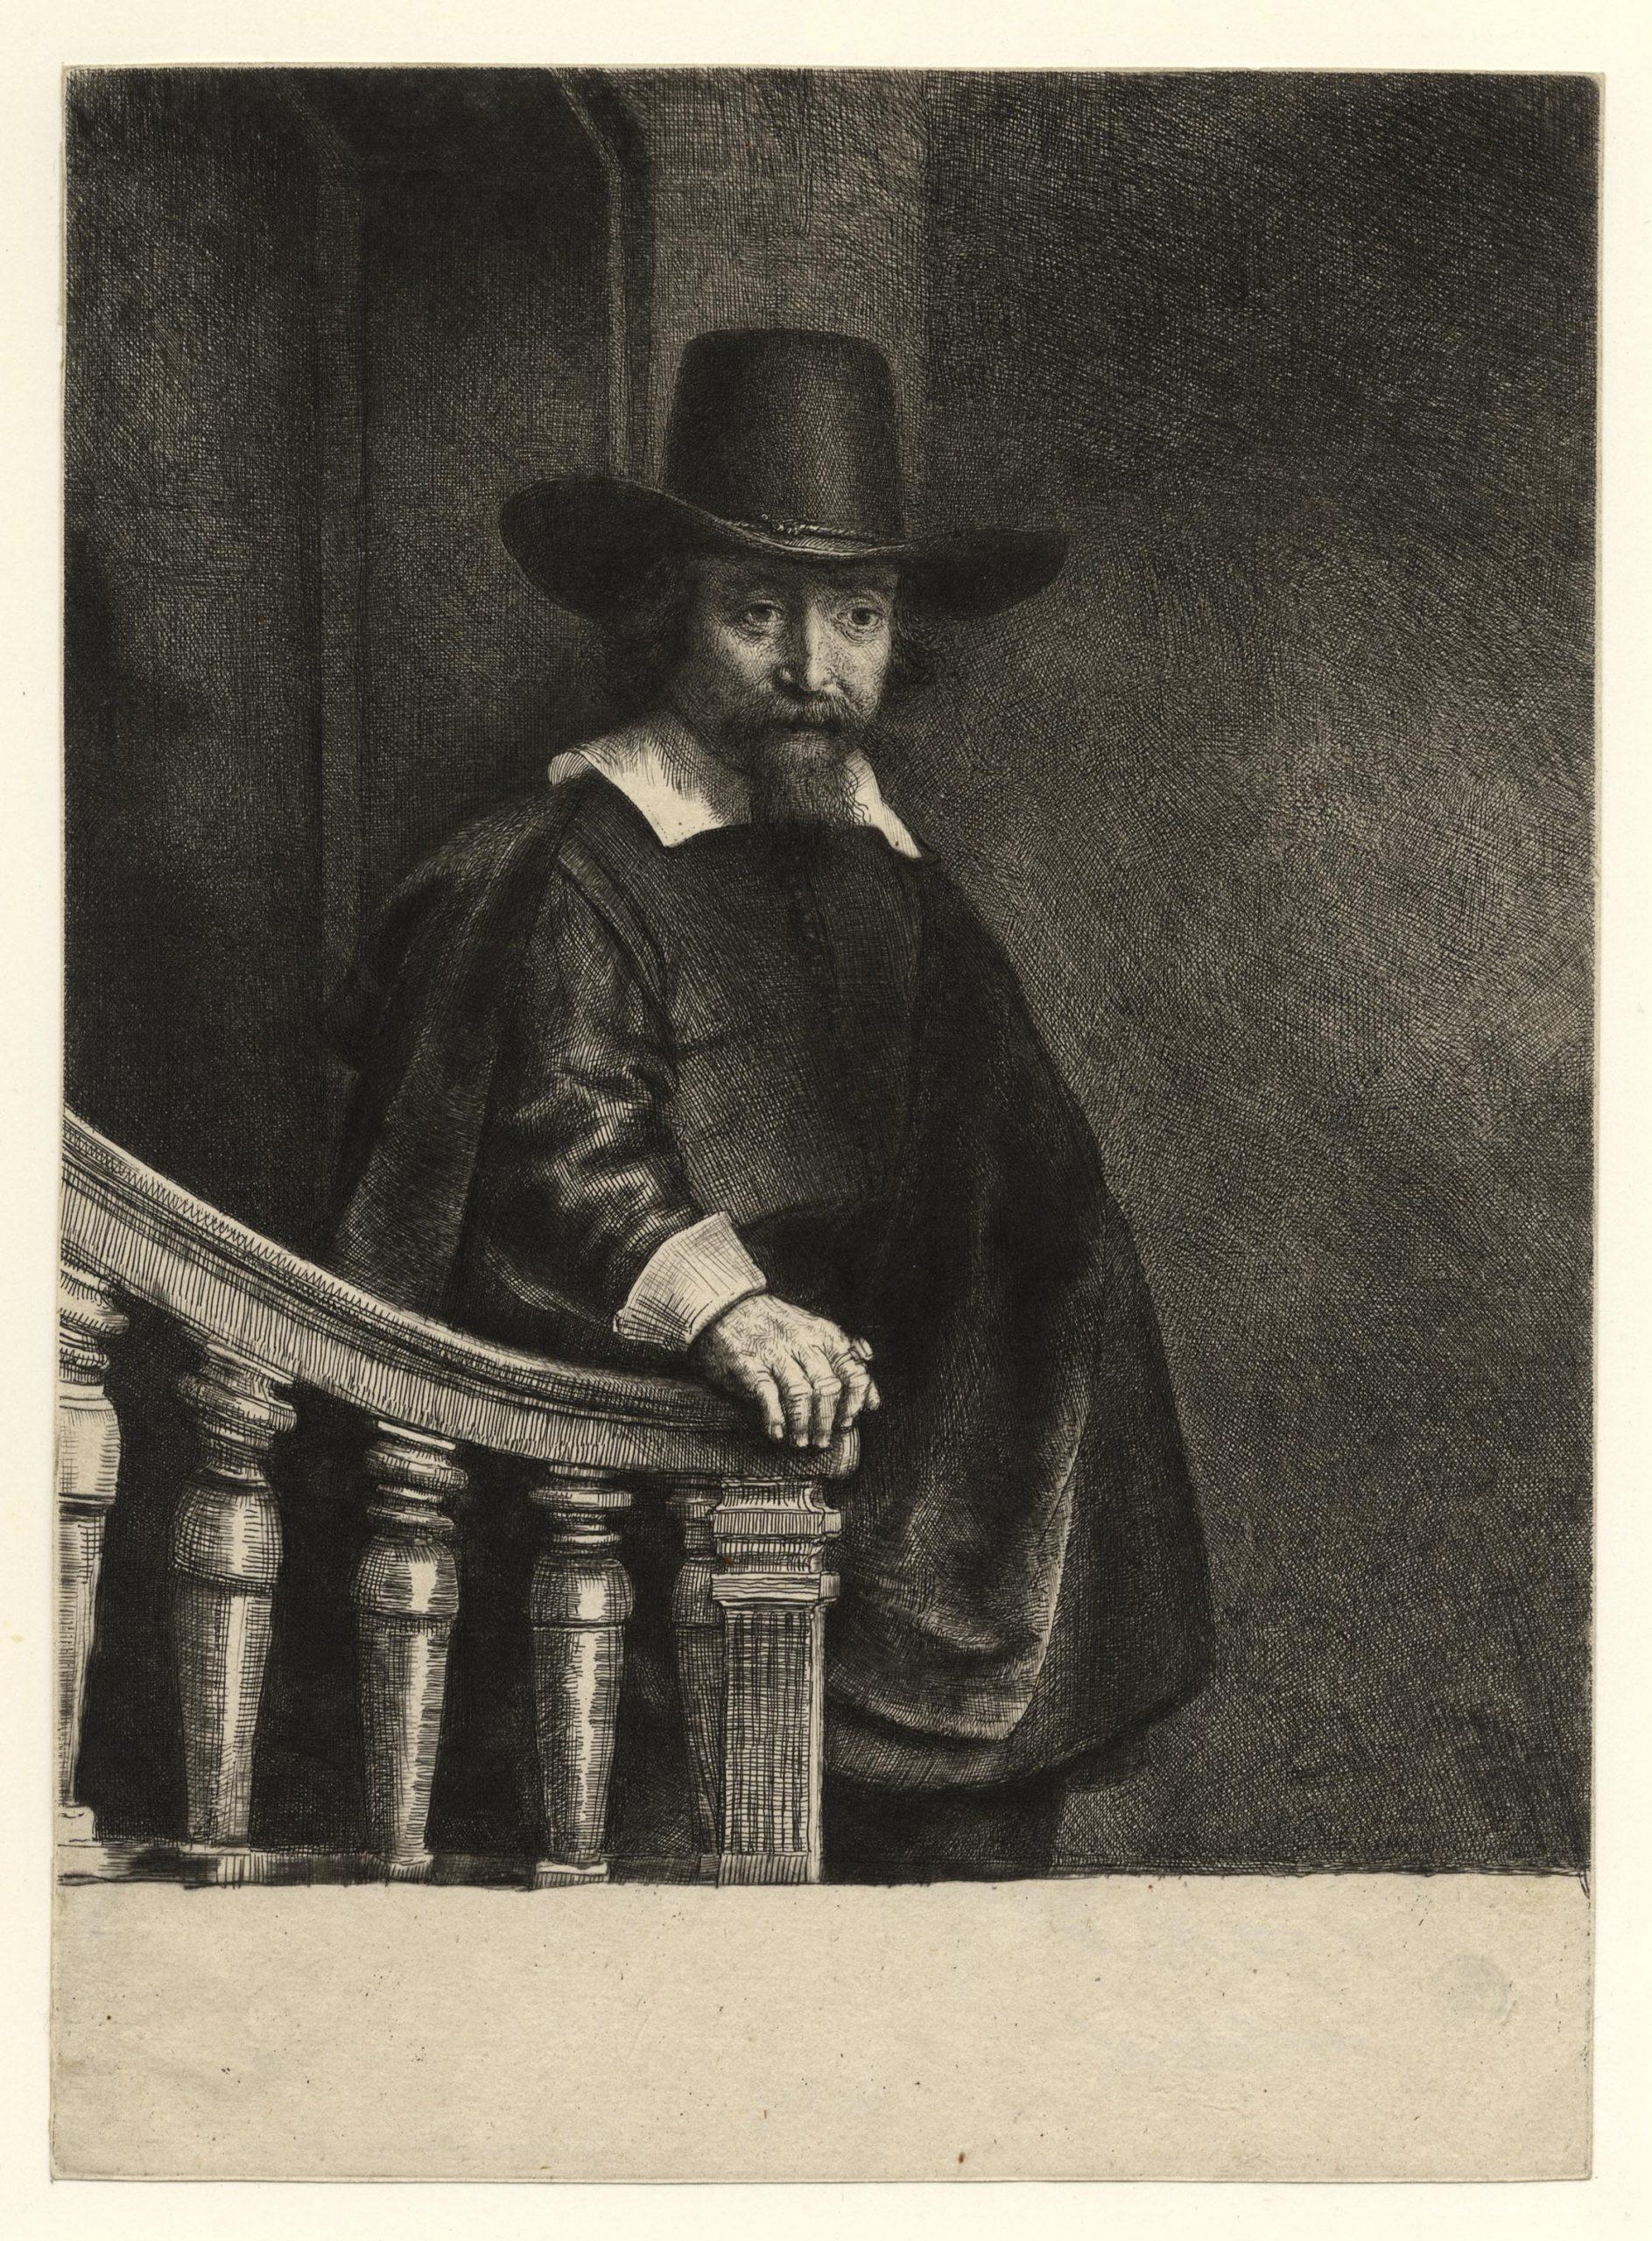 Ephraim Bonus, Jewish Physician 1647 by Harmensz van Rijn Rembrandt